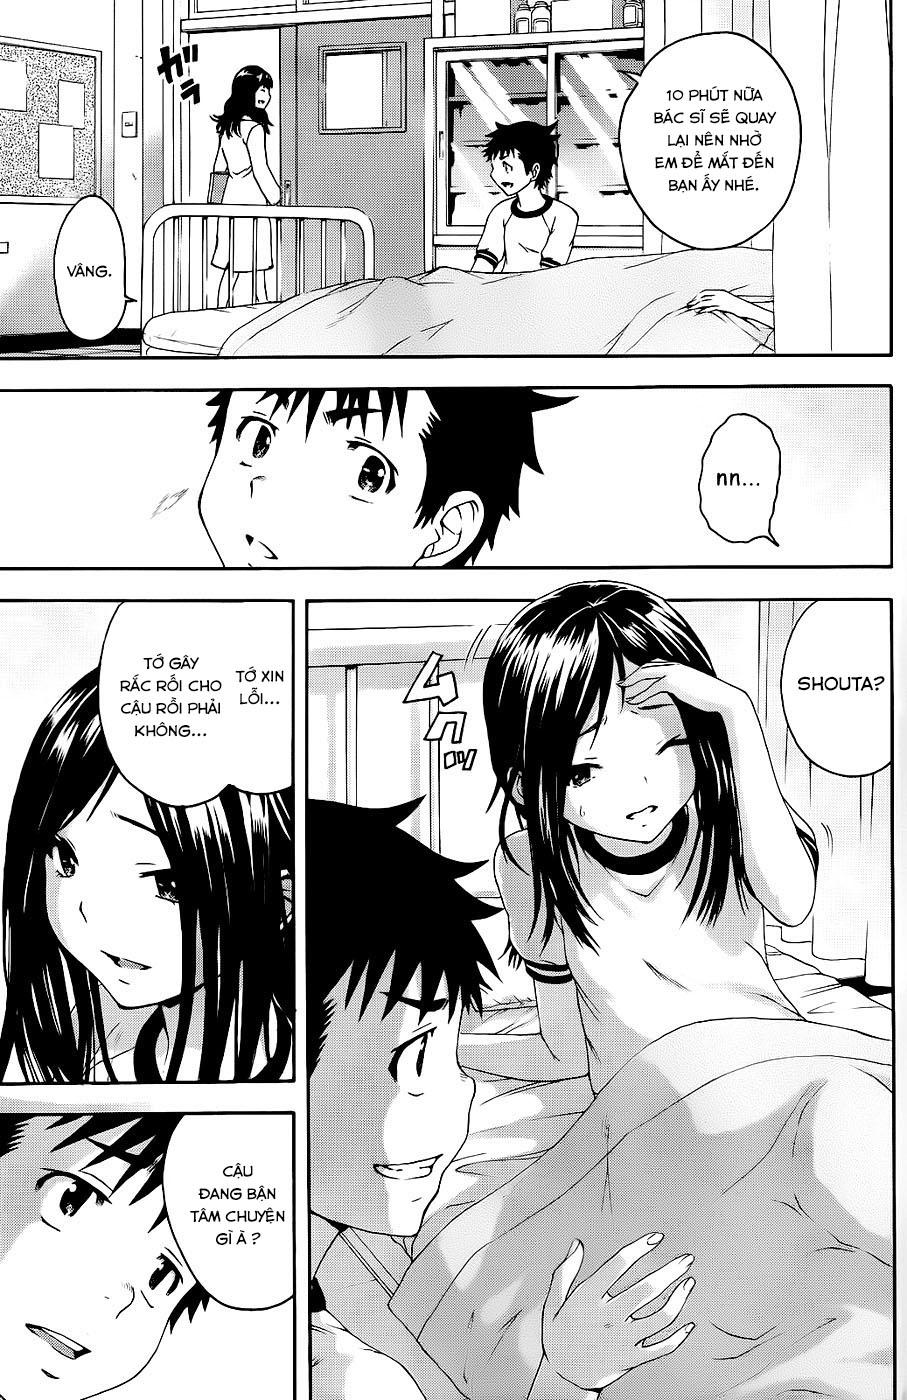 Hình ảnh Mujaki%2Bno%2Brakuen%2B %2Bchap%2B48013 in [Siêu phẩm] Mujaki no Rakuen Hentai Series